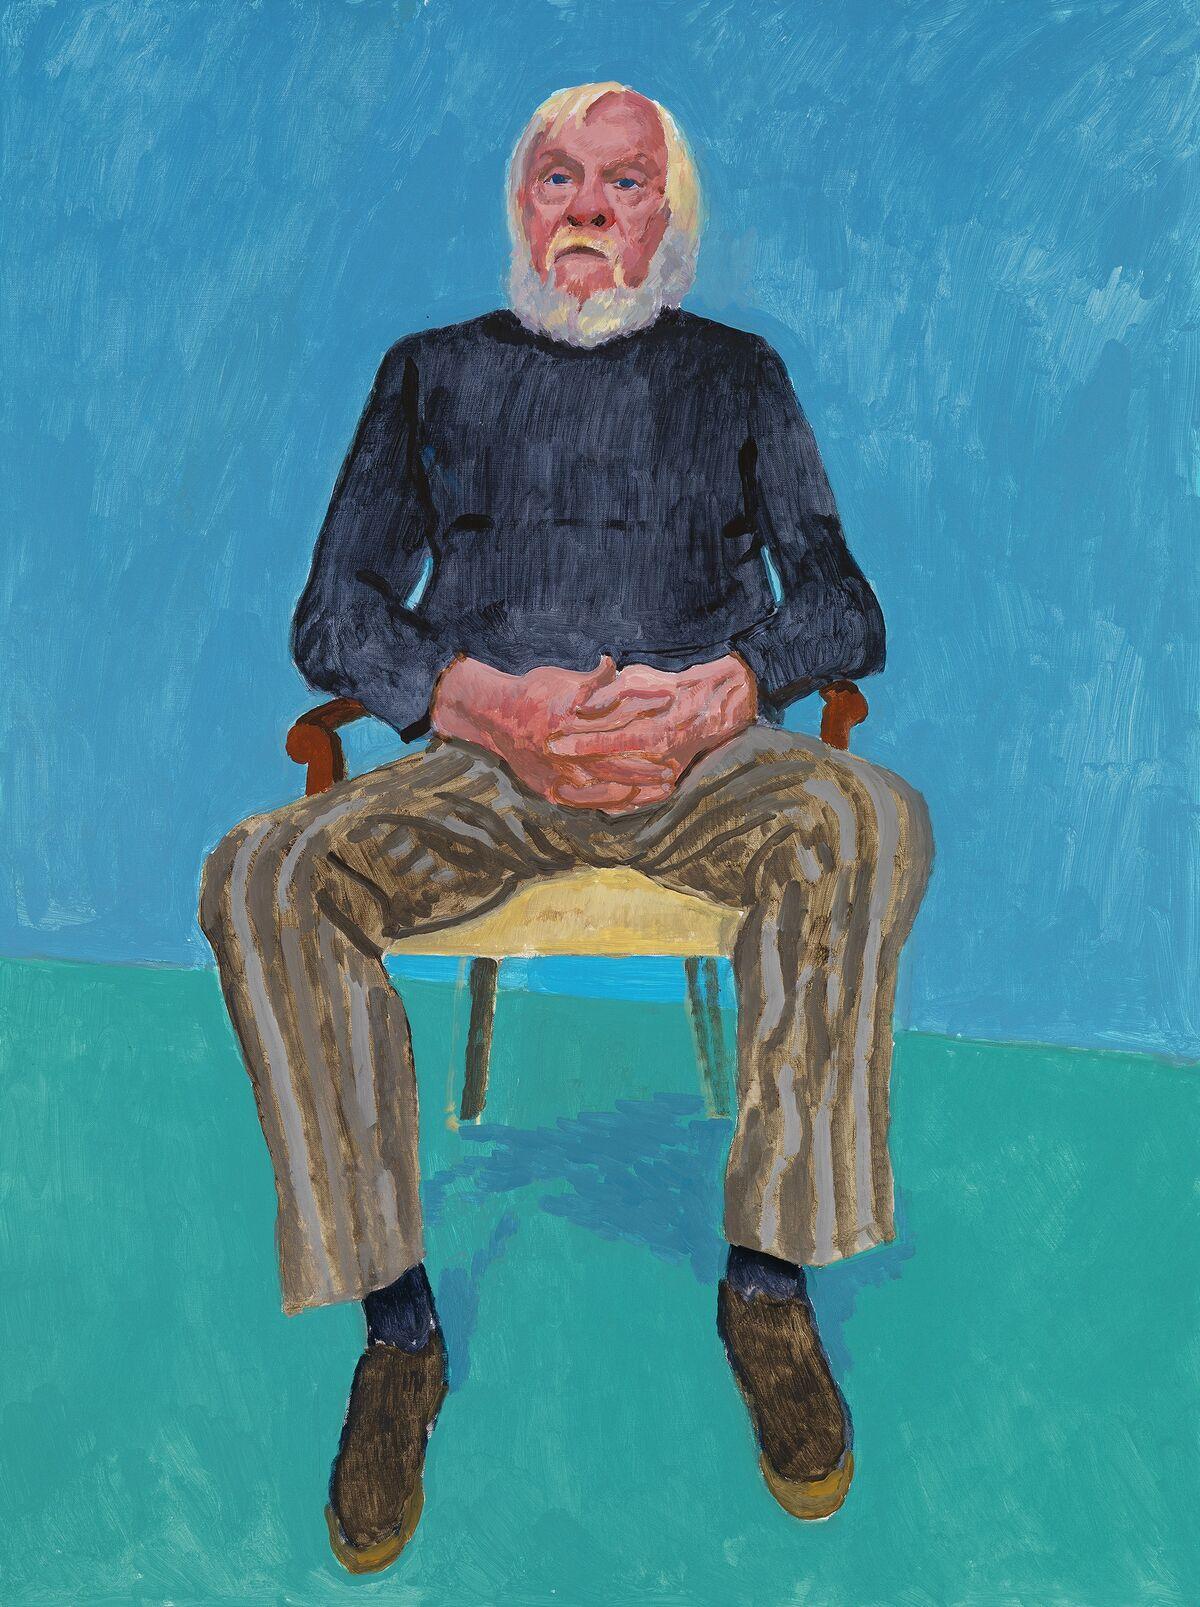 "David Hockney, John Baldessari, 13th, 16th December 2013, 2013, from ""82 Portraits and 1 Still-life."" © David Hockney. Photo by Richard Schmidt. Courtesy of the Los Angeles Museum of Art."